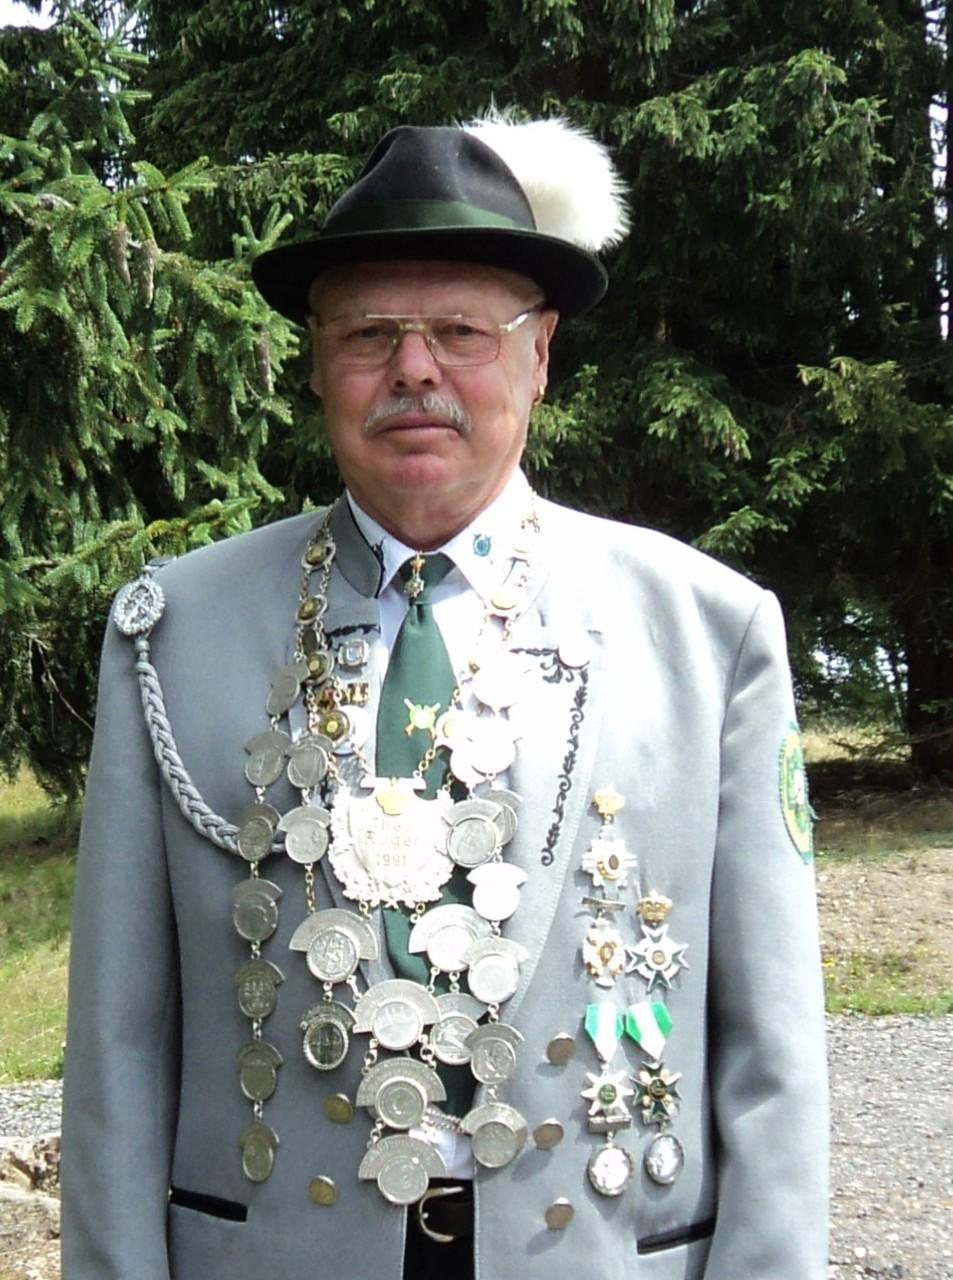 Schützenkönig 2015: Wilfried Rienecker (3.0)